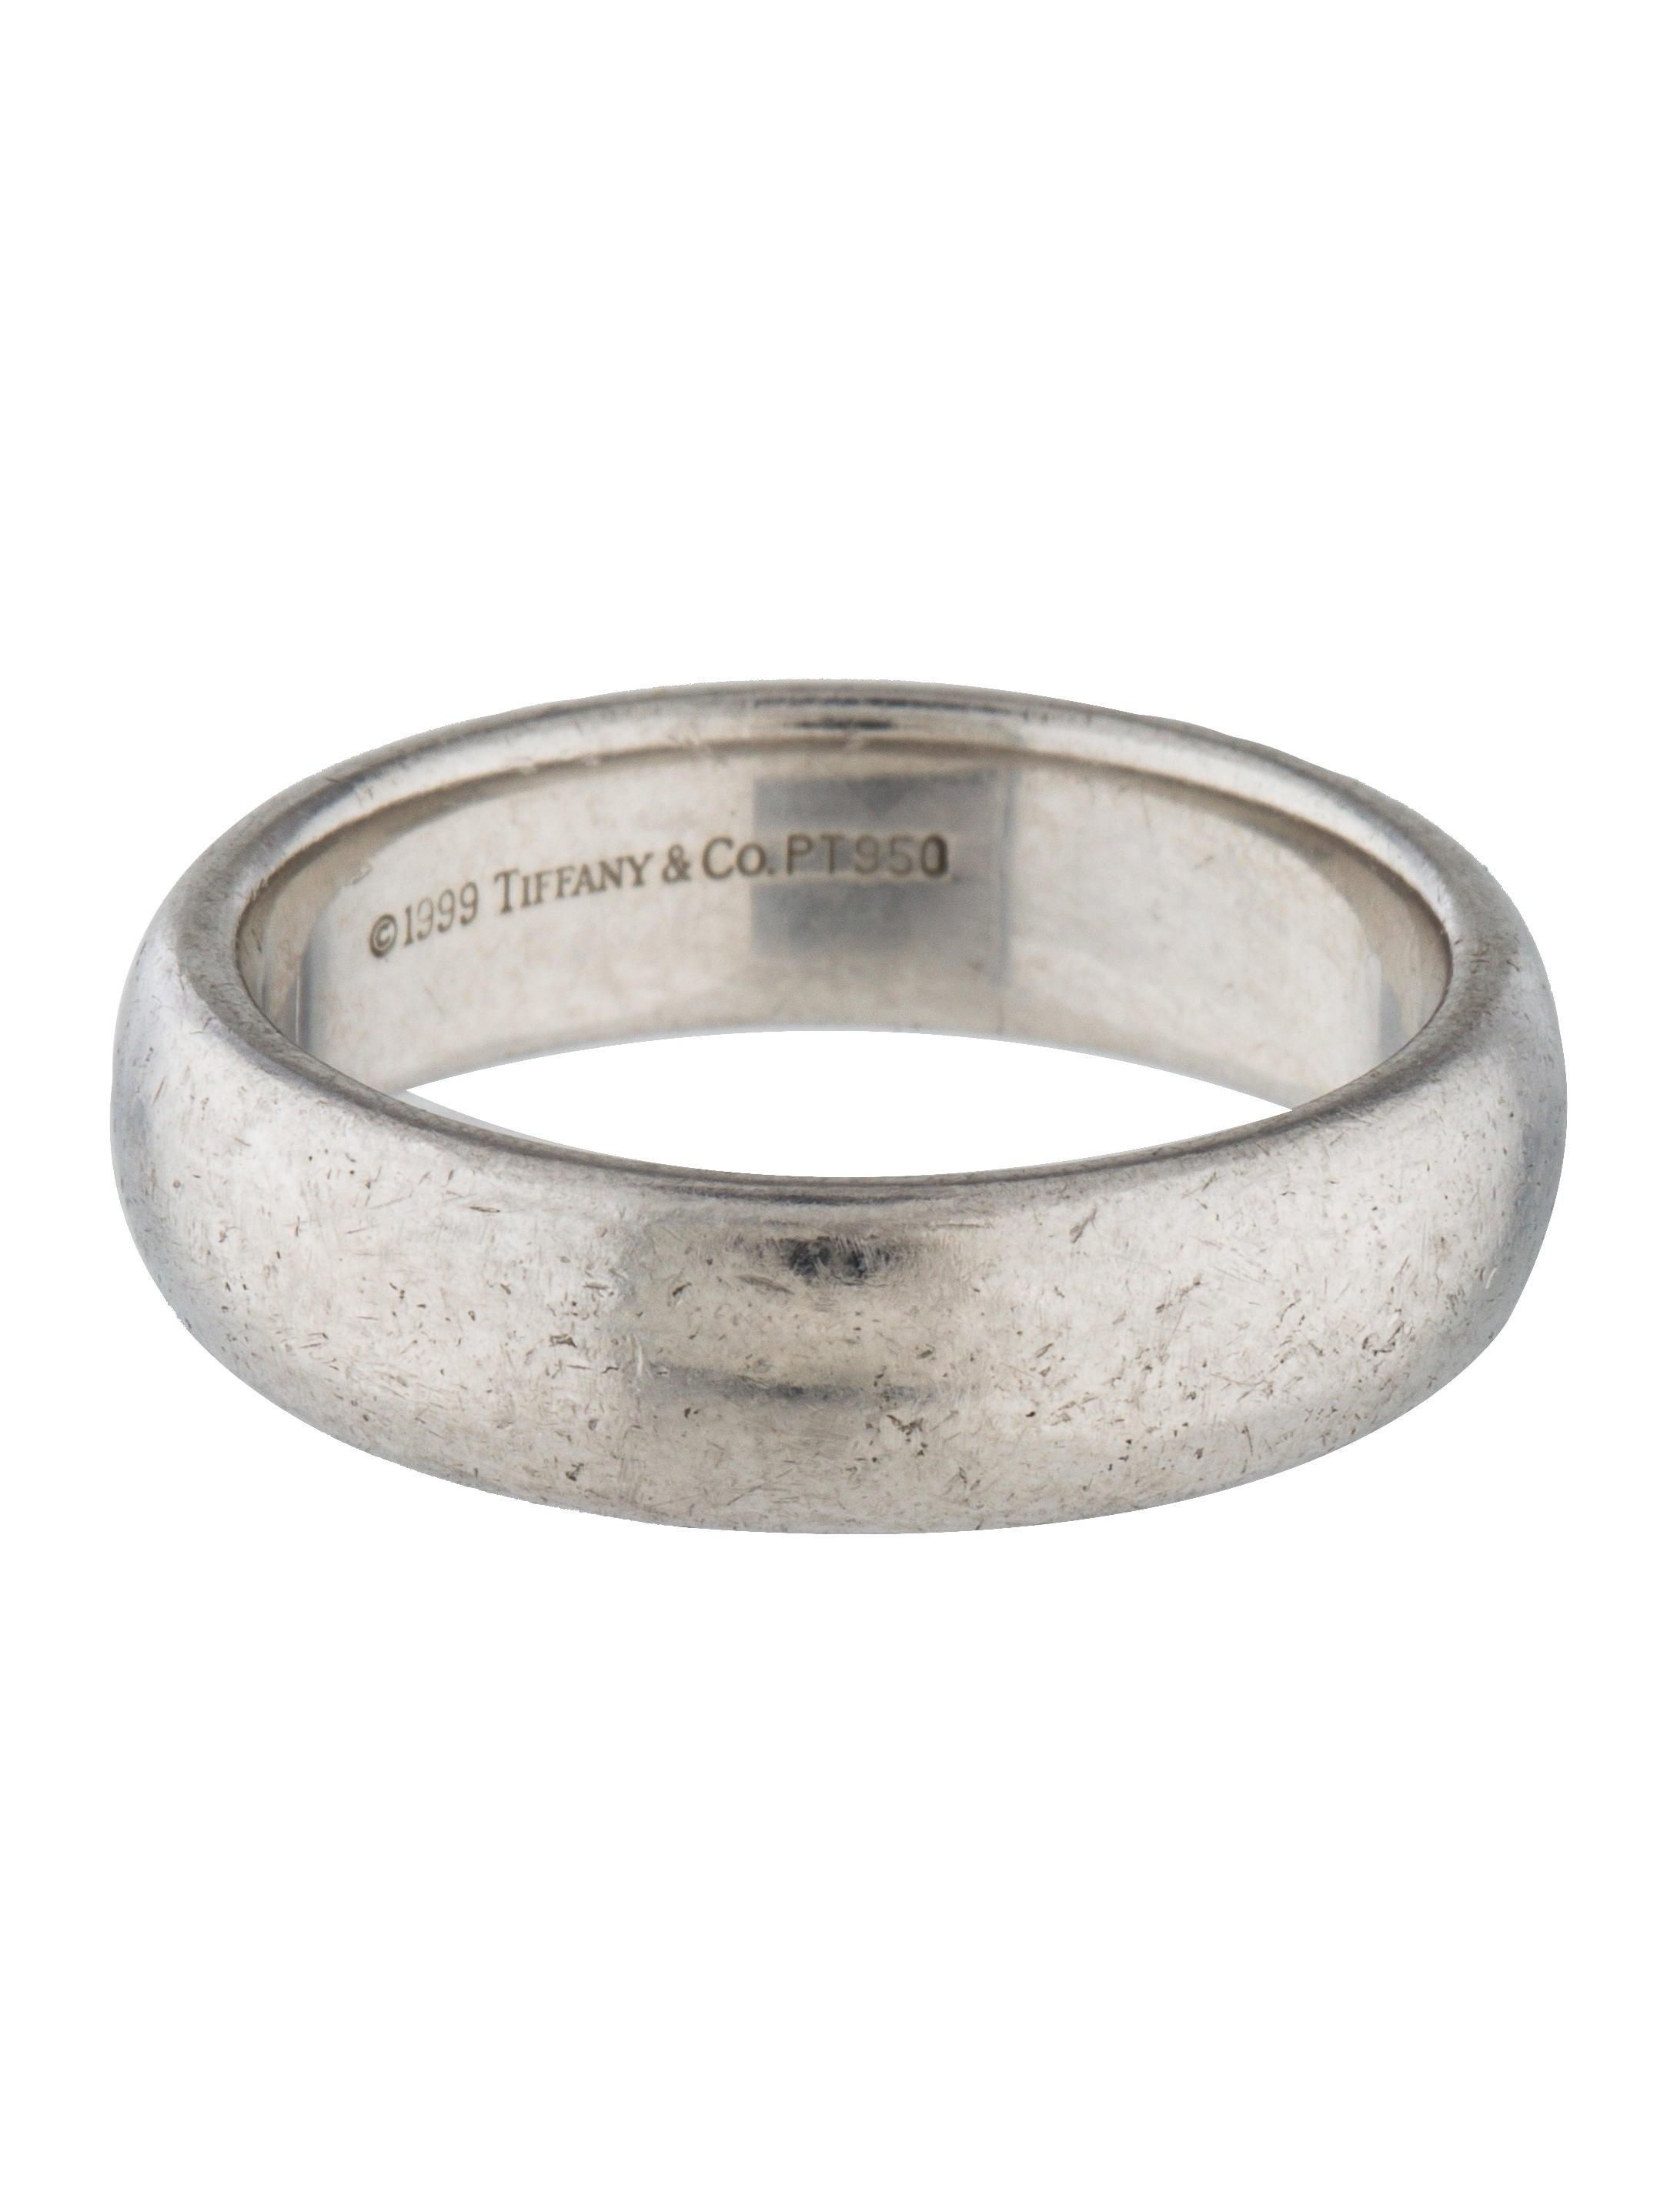 Tiffany Co Platinum Wedding Ring Rings TIF60573 The RealReal